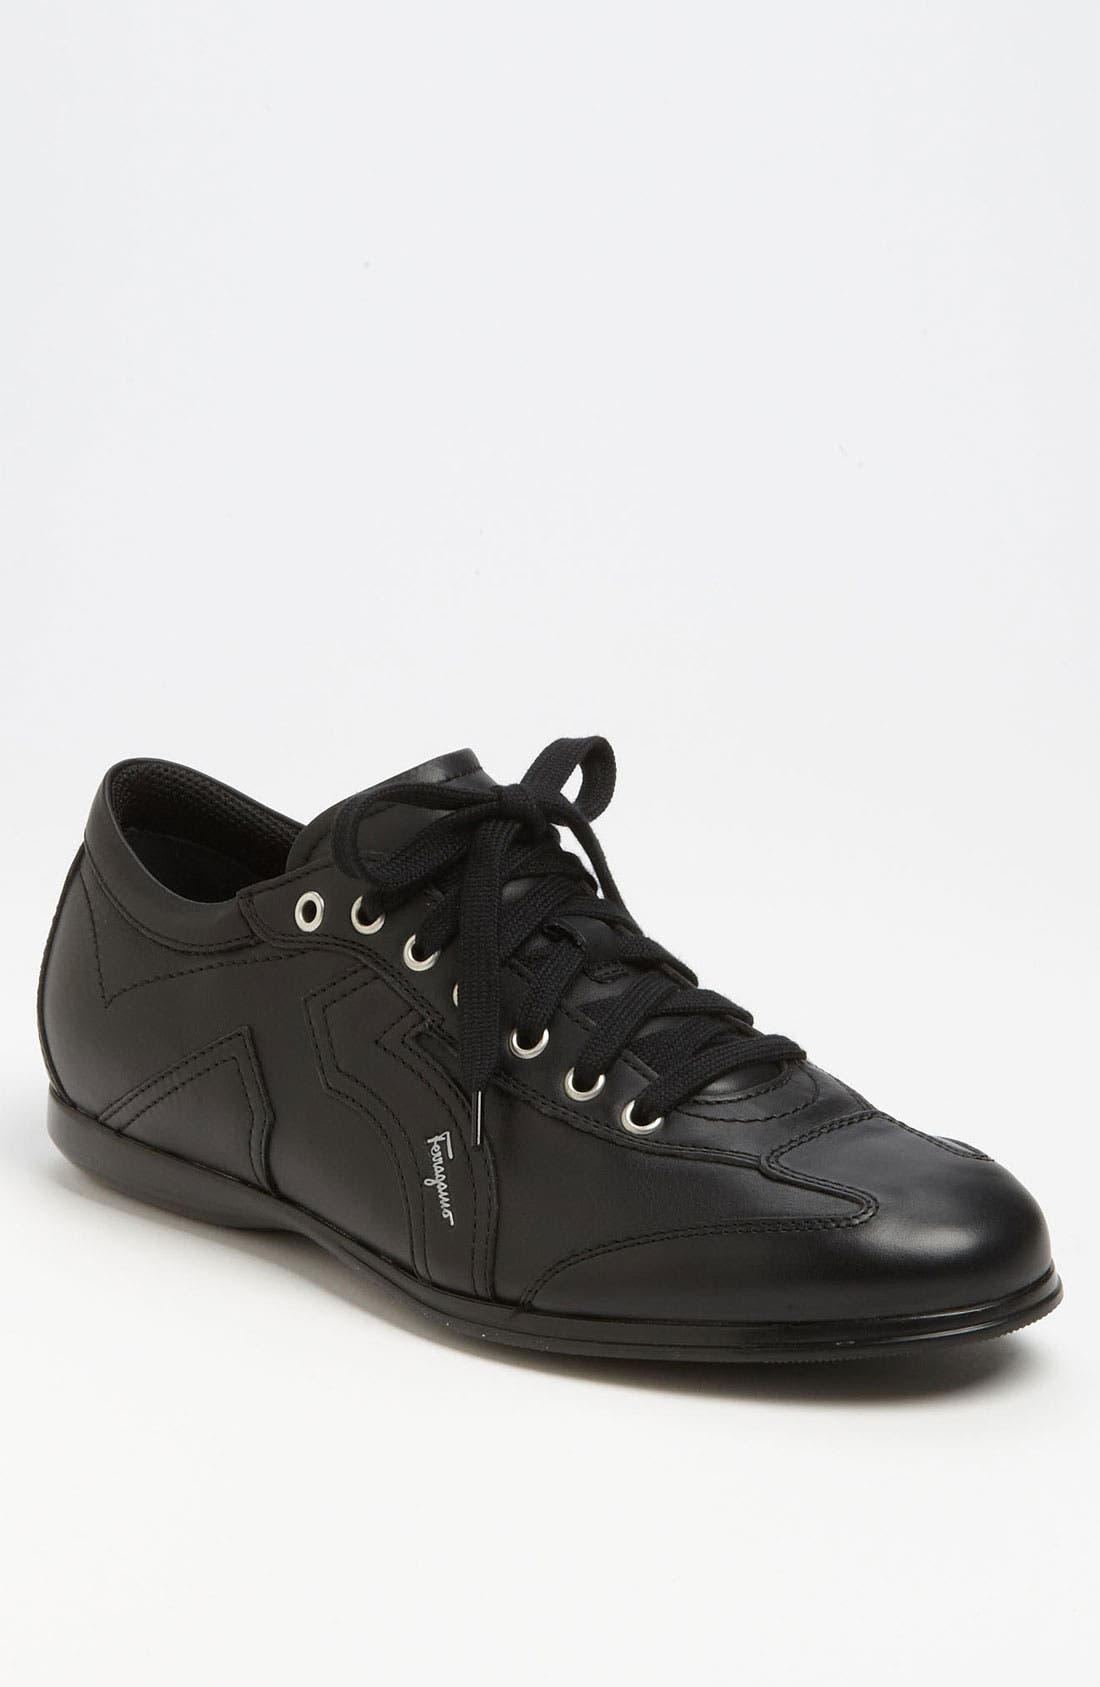 Alternate Image 1 Selected - Salvatore Ferragamo 'Millie 6' Sneaker